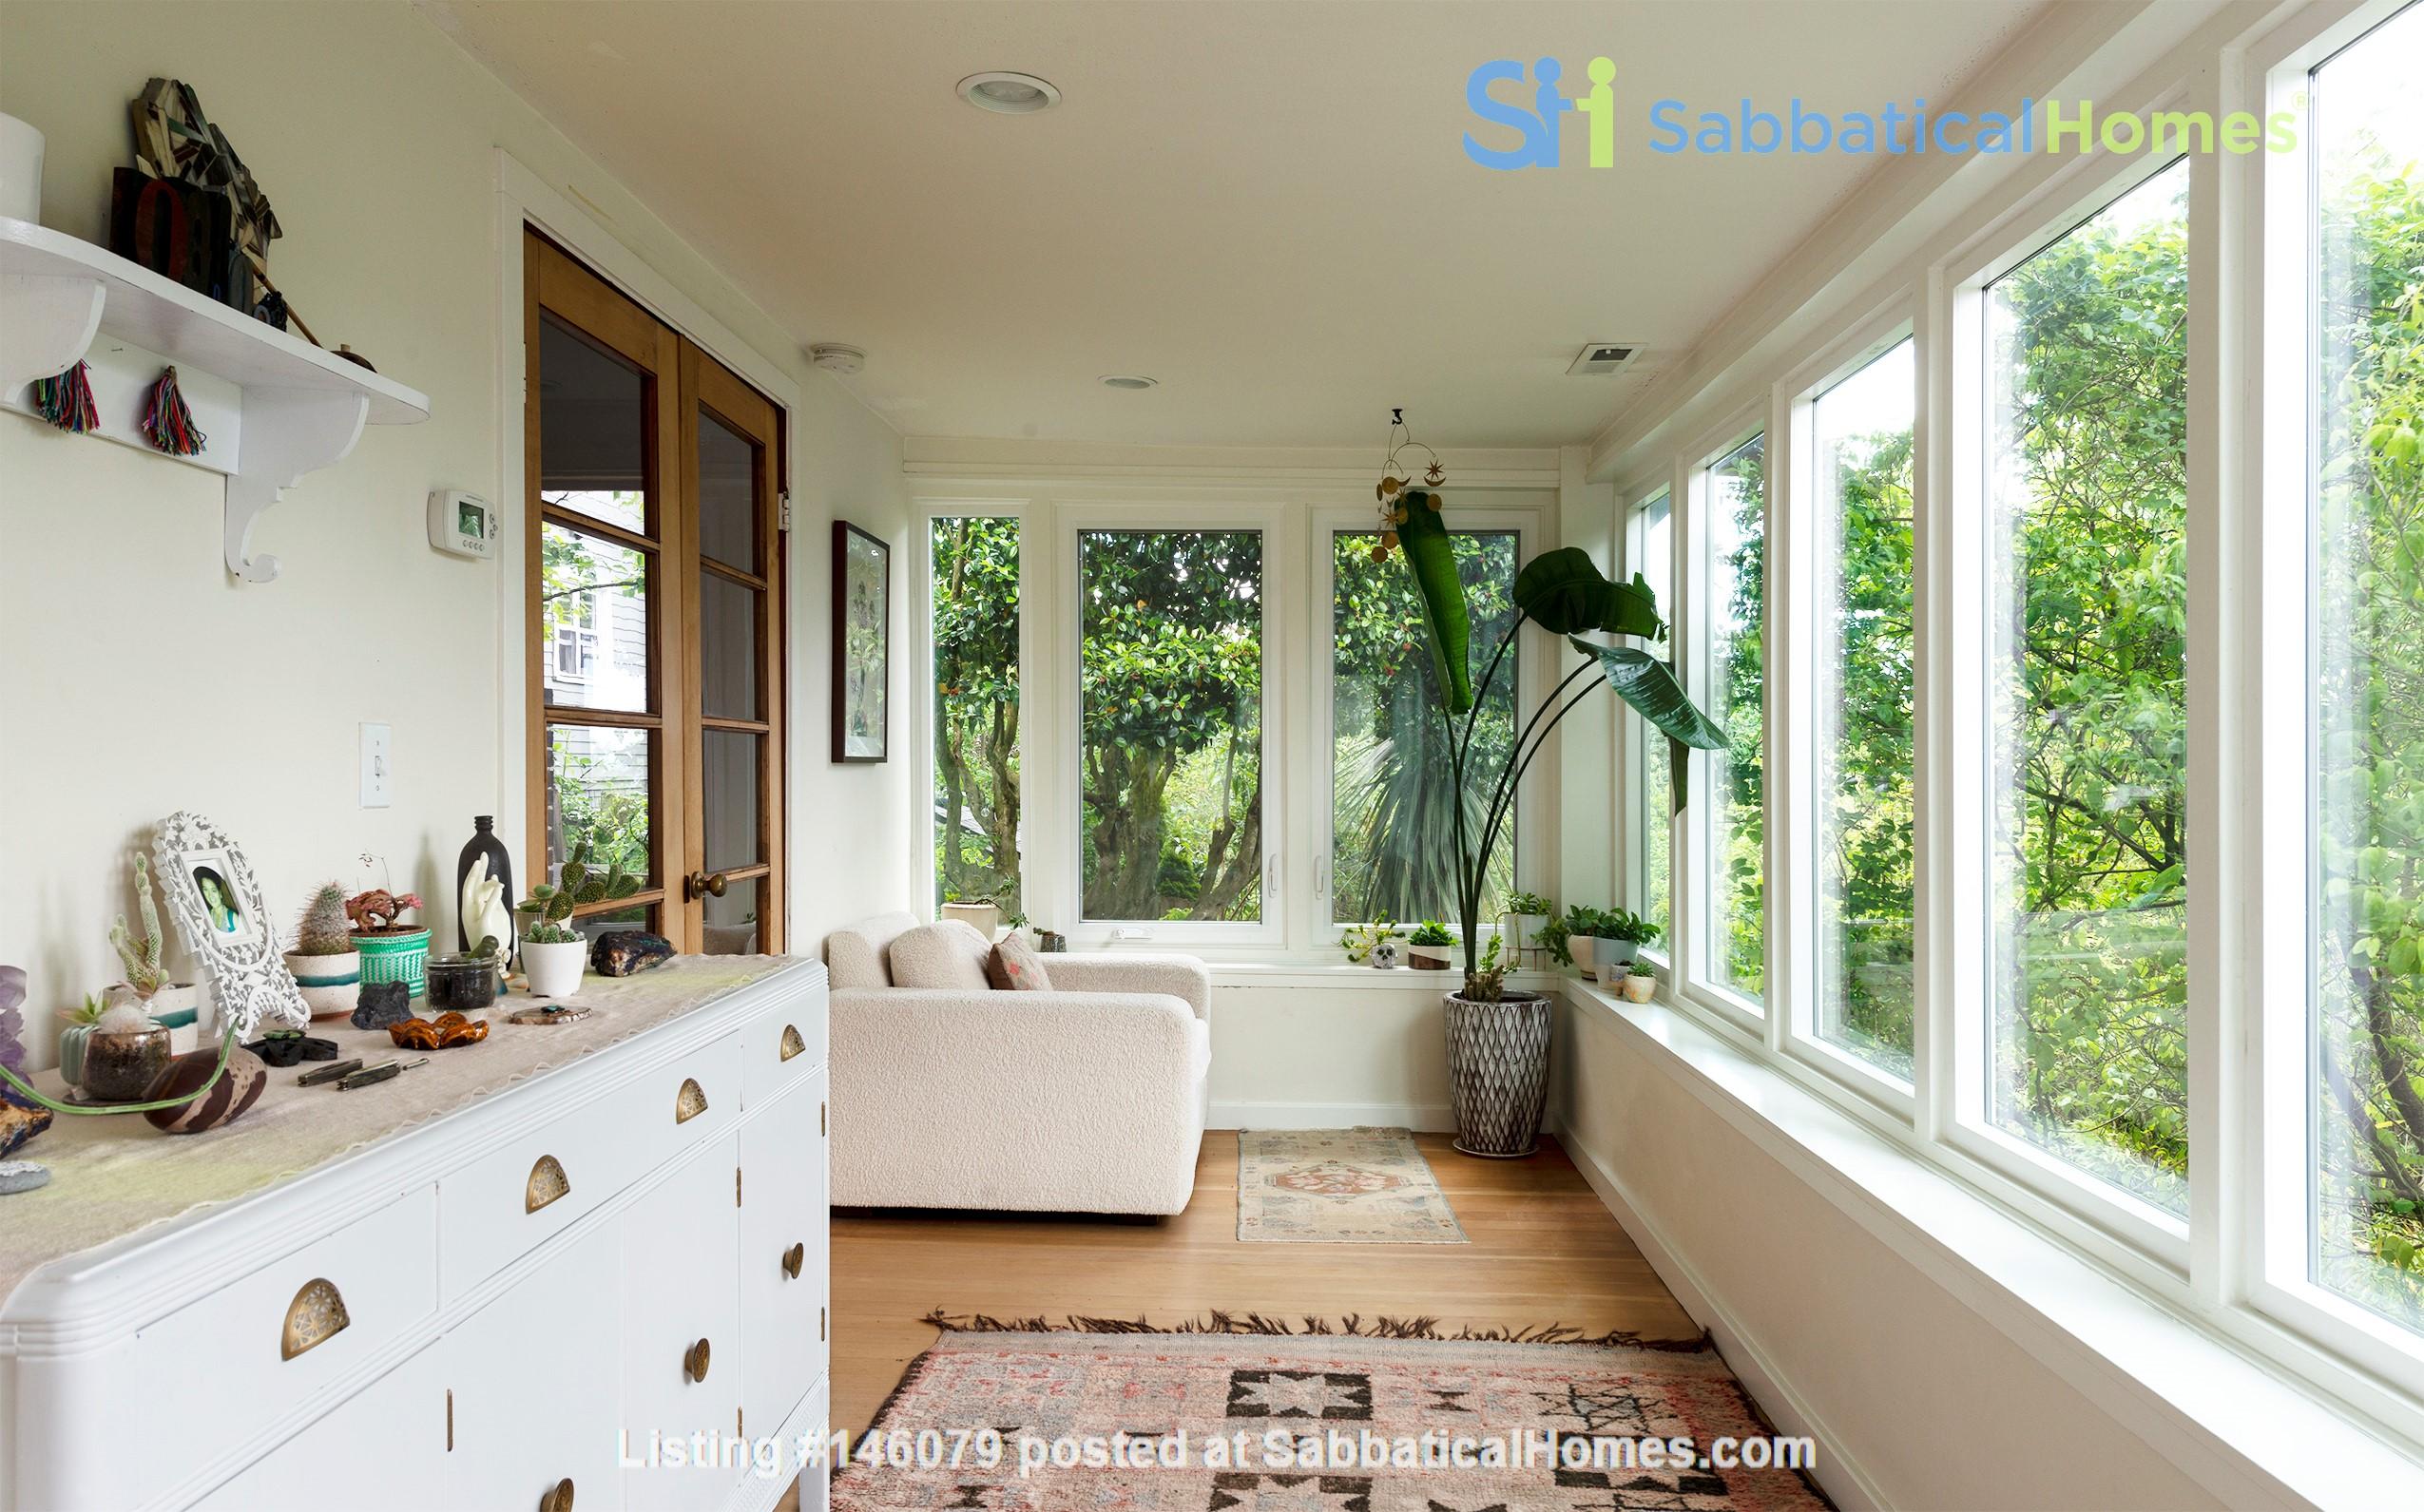 Scandinavian Queen Anne Home Home Rental in Seattle 7